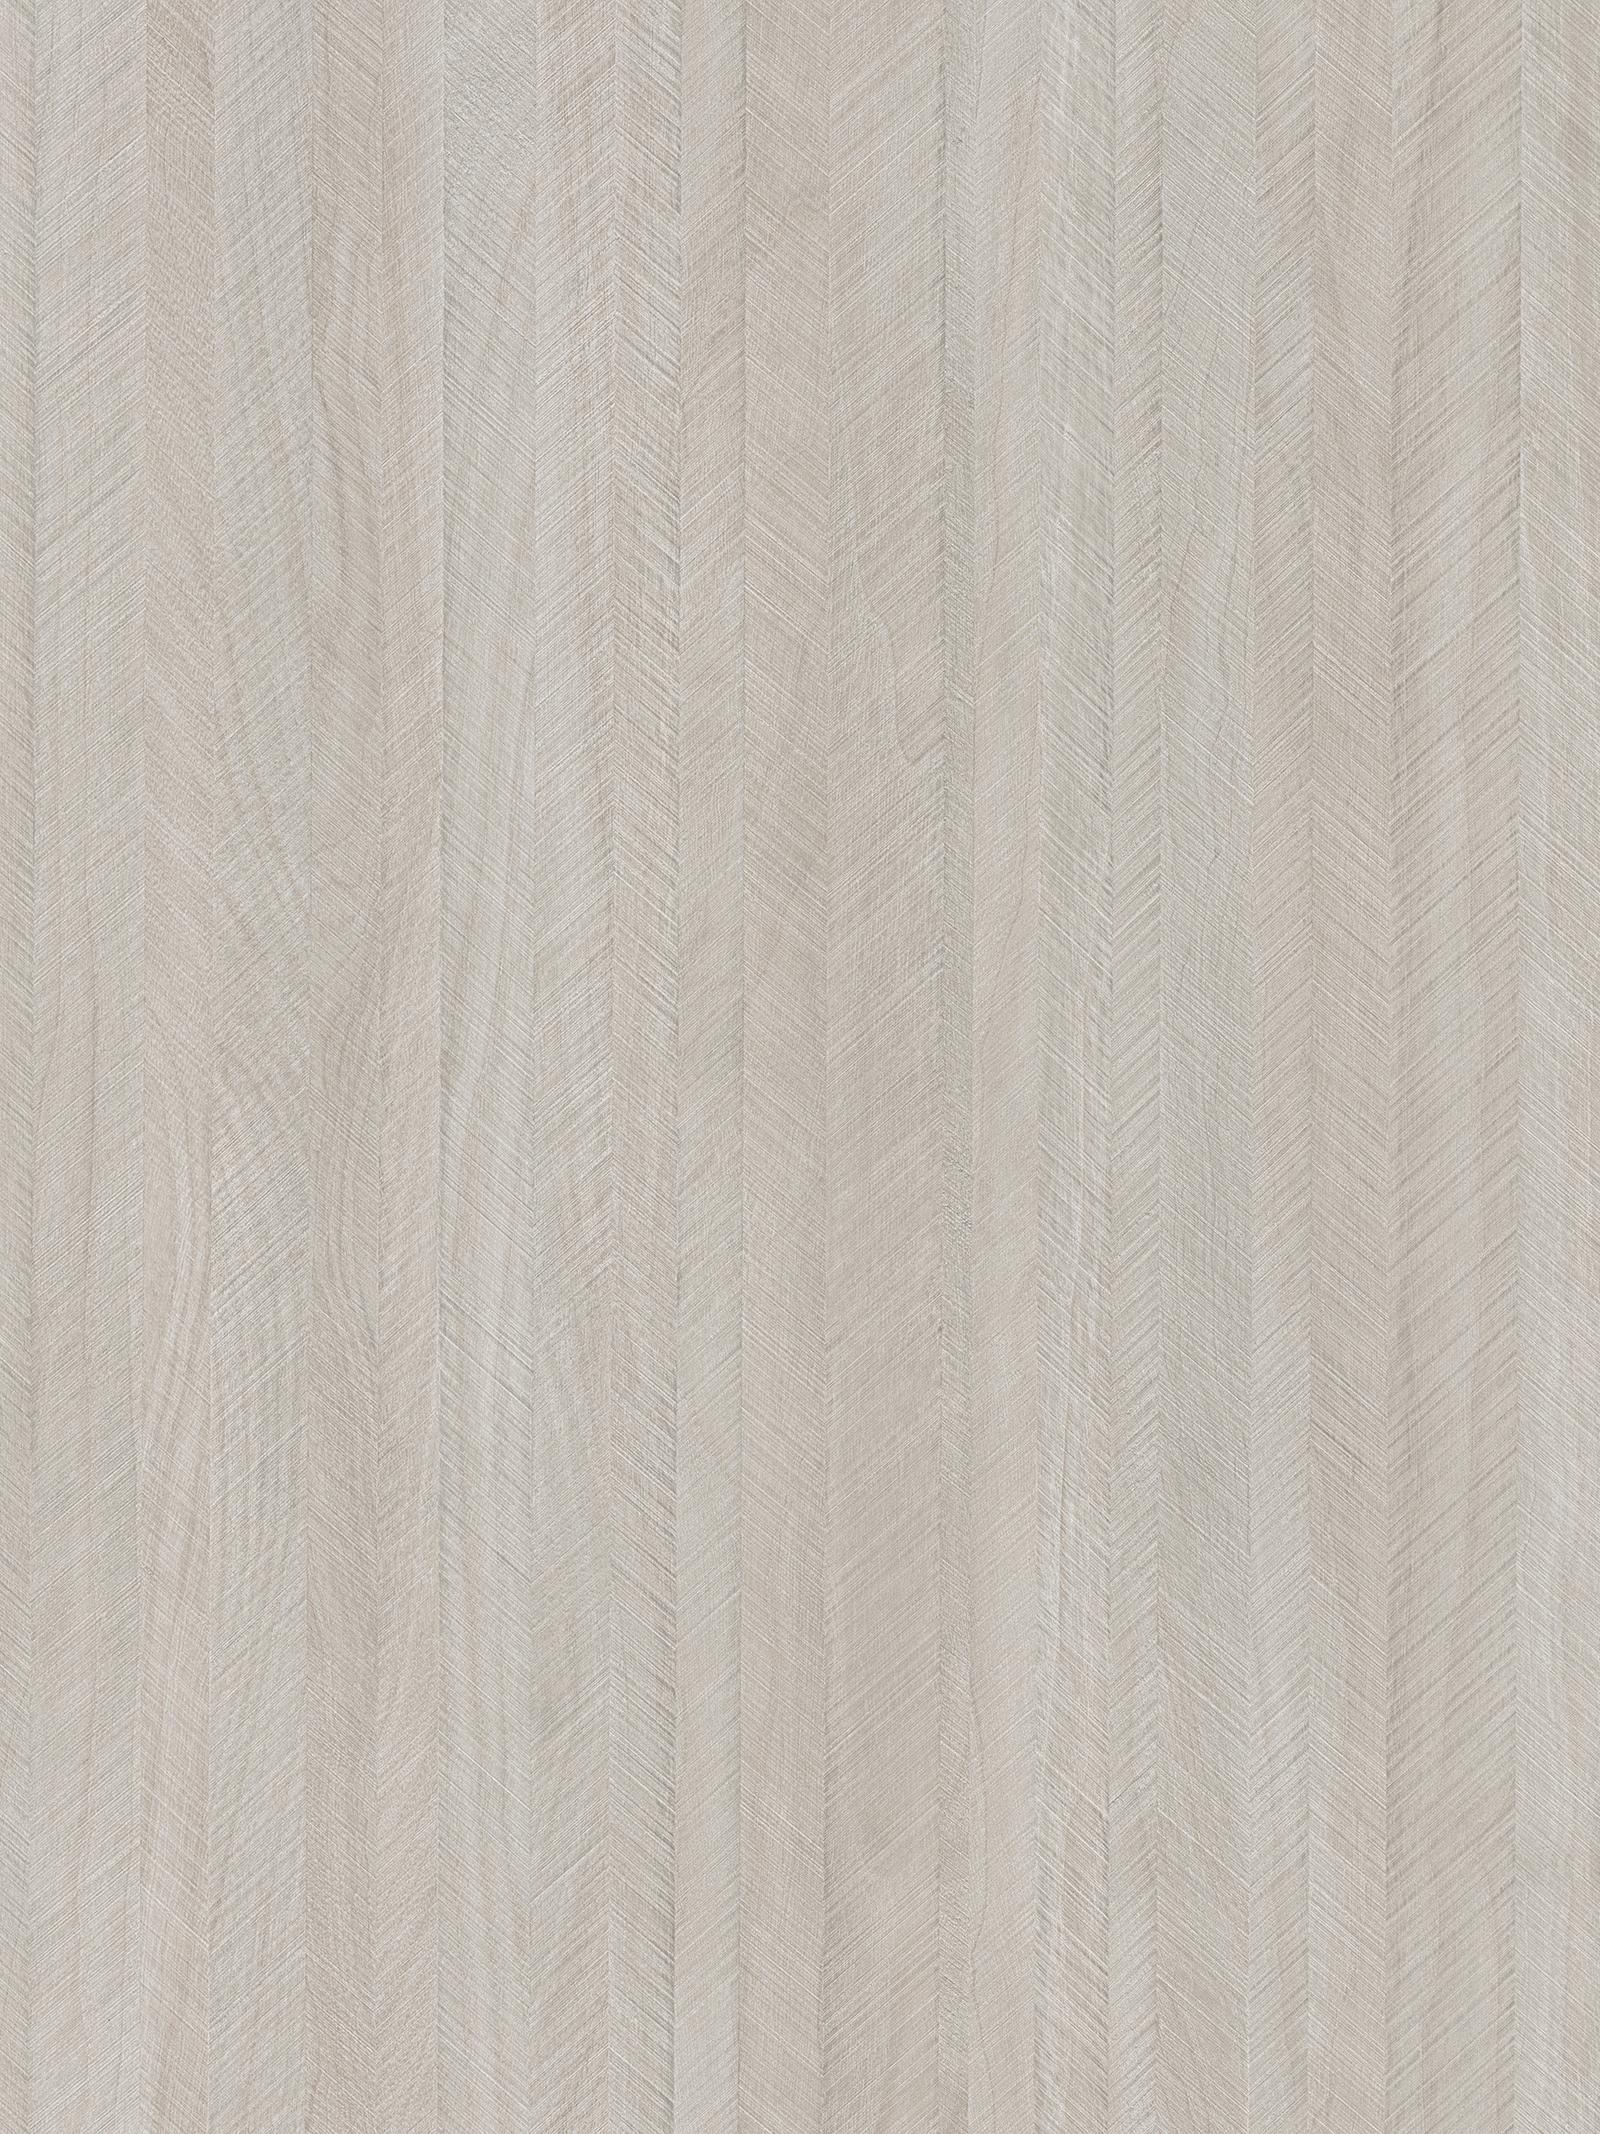 DecoLegno 5377 Dandy Wood detail